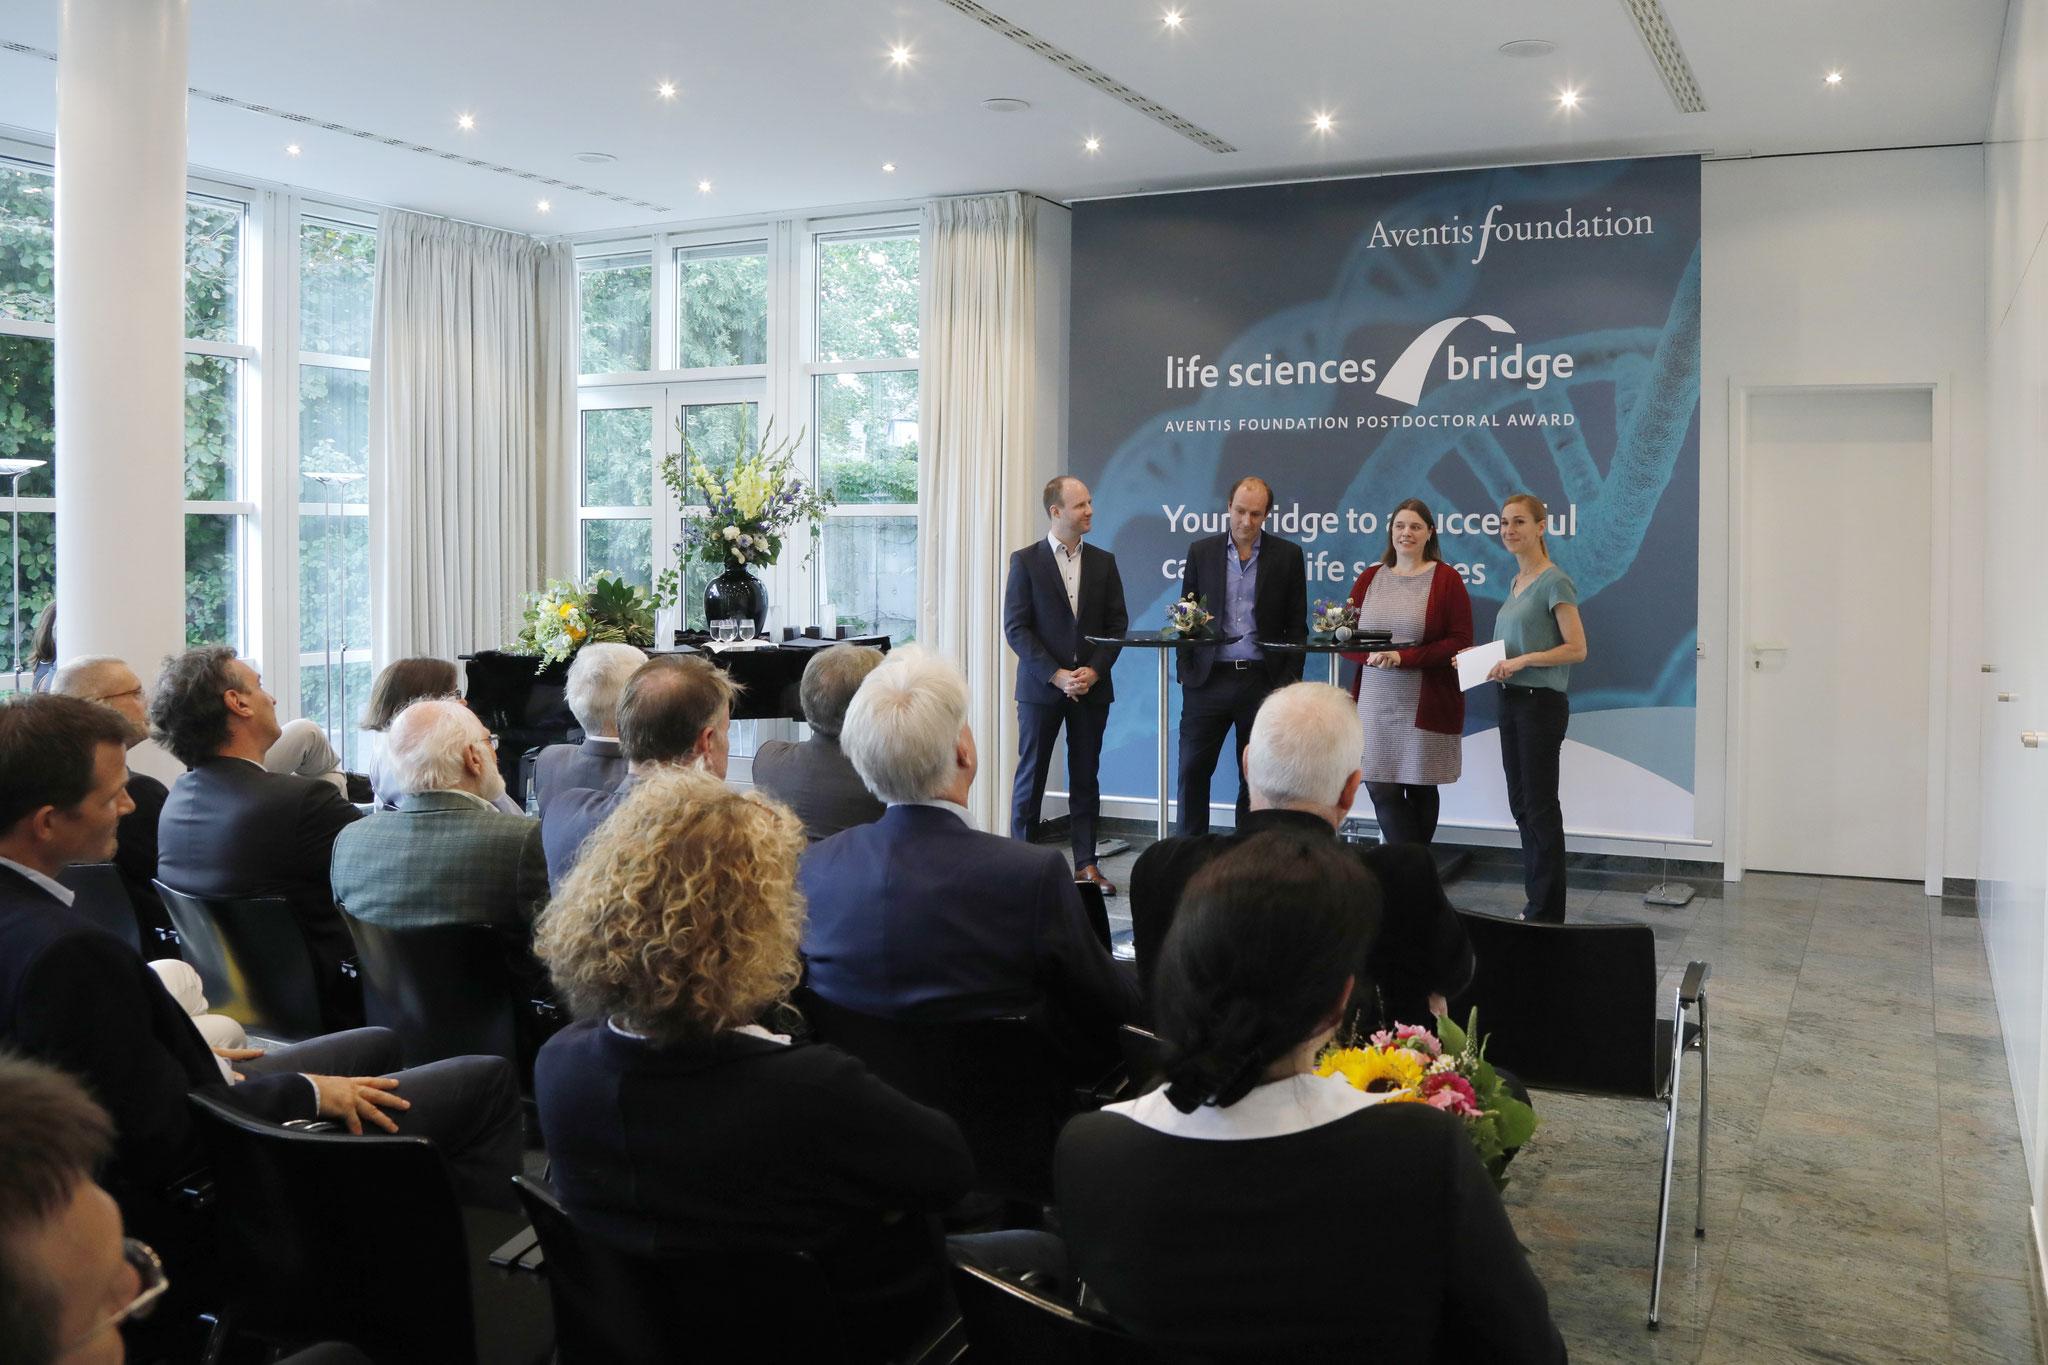 Preisverleihung Aventis Foundation Postdoctoral Award @Uwe Dettmar